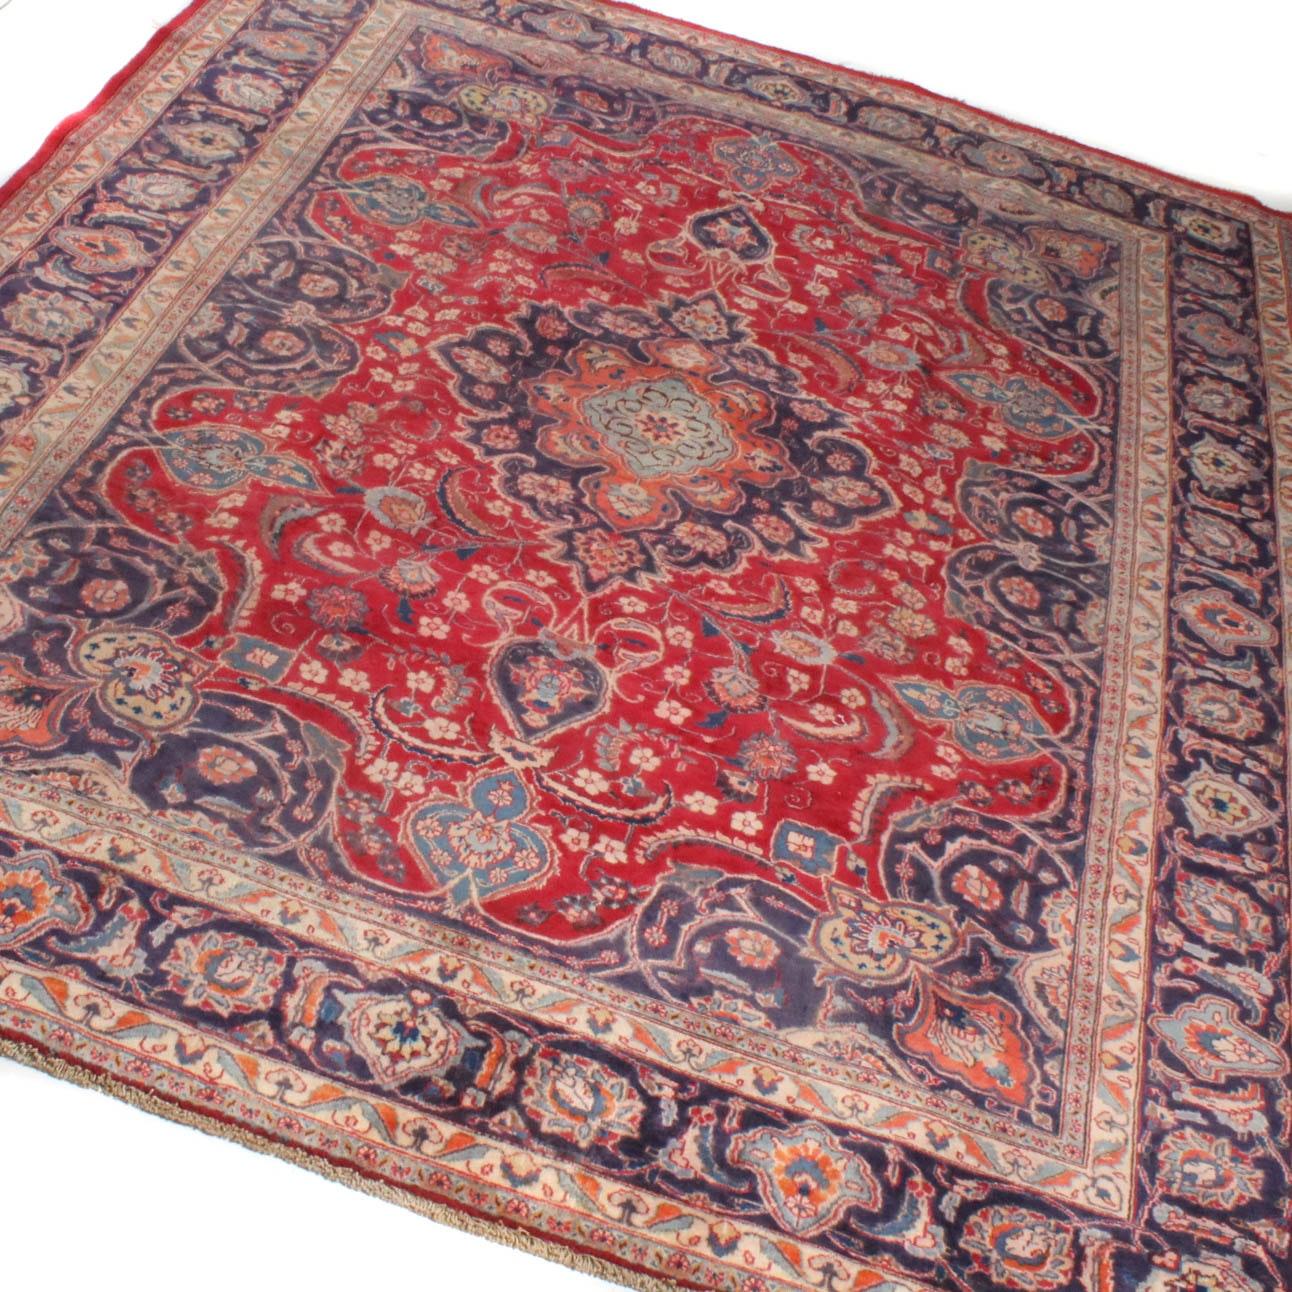 Vintage Hand-Knotted Persian Mashhad Rug